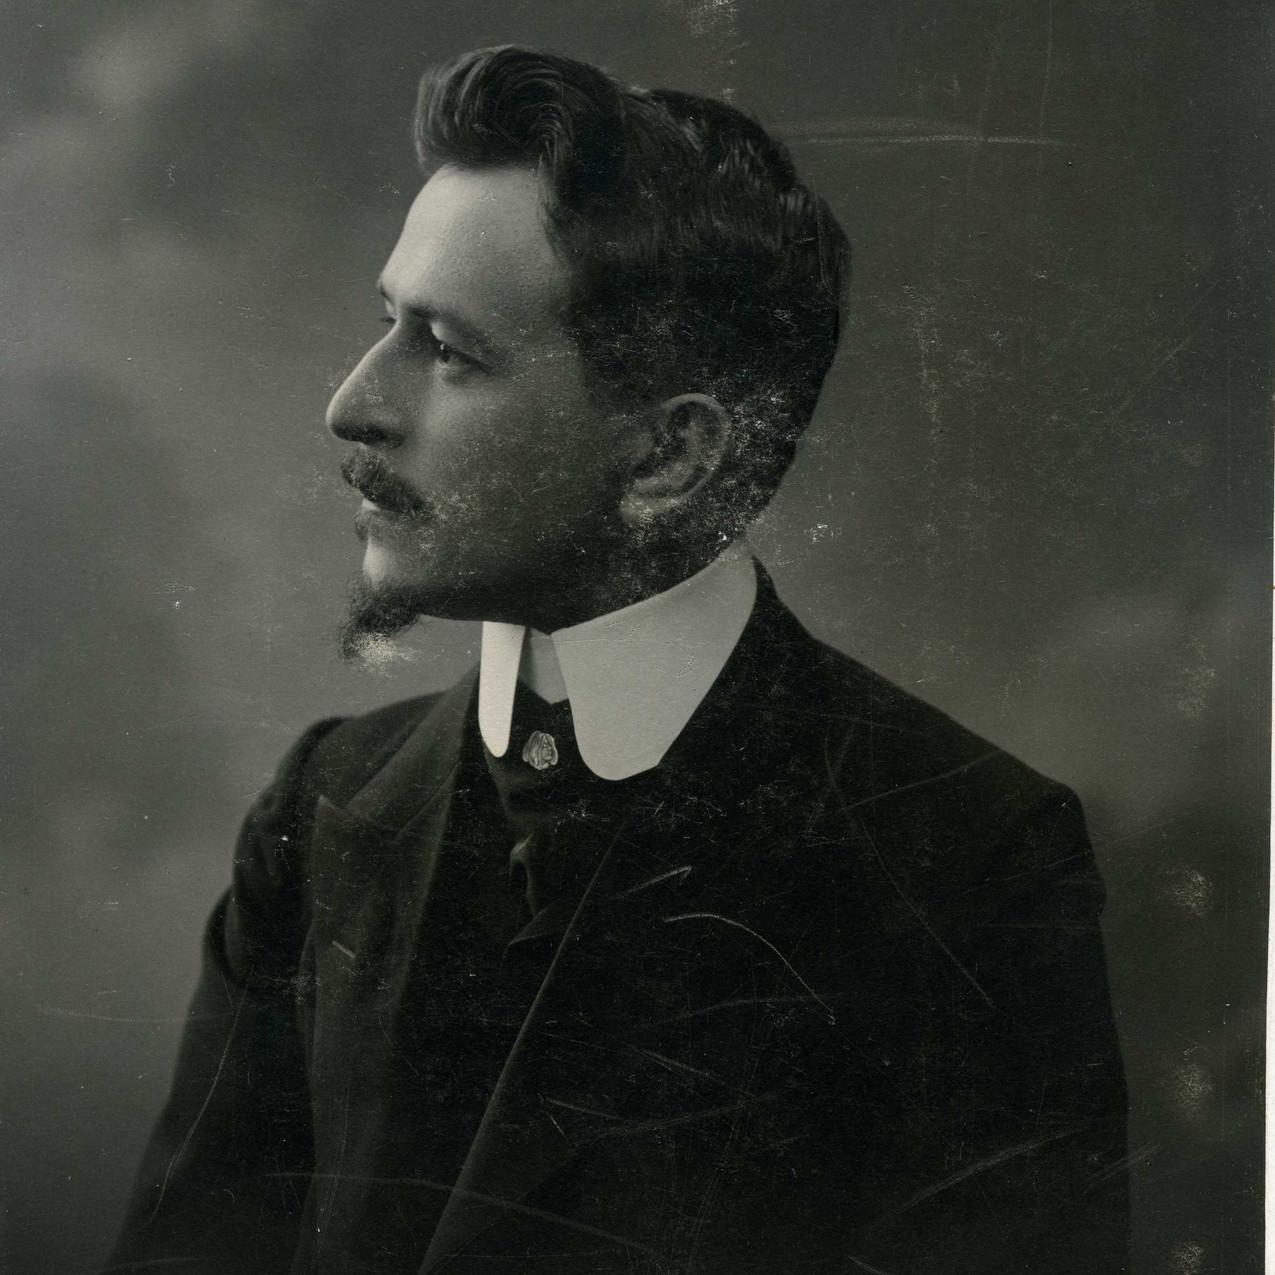 П.М. Дульский. 1910-е гг.